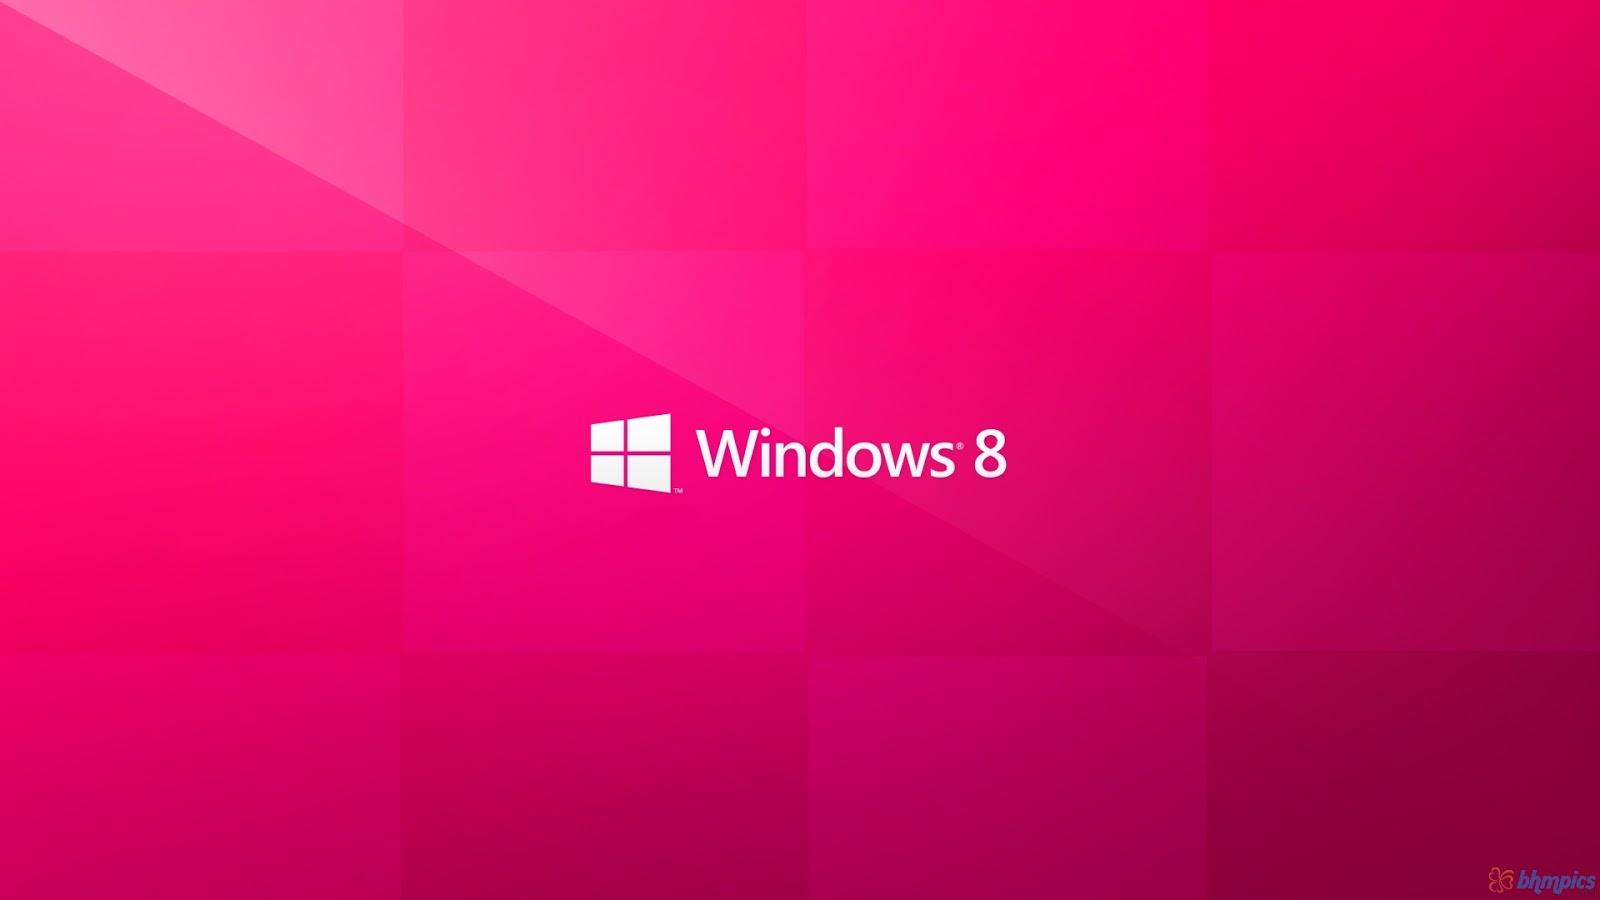 Wallpaper Com Windows 8